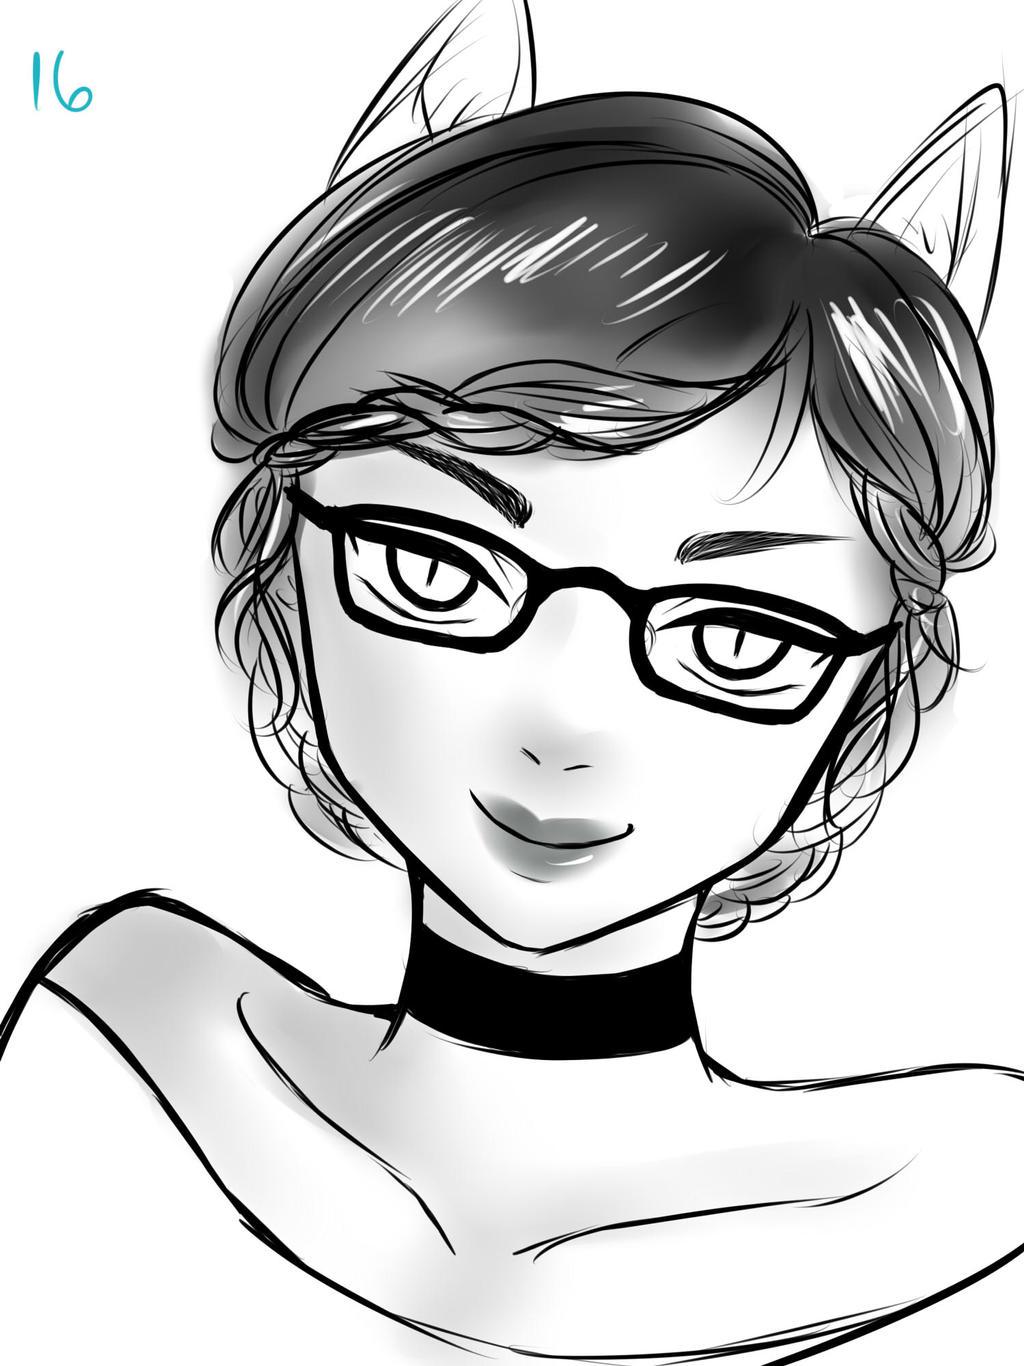 Day 16: Glasses